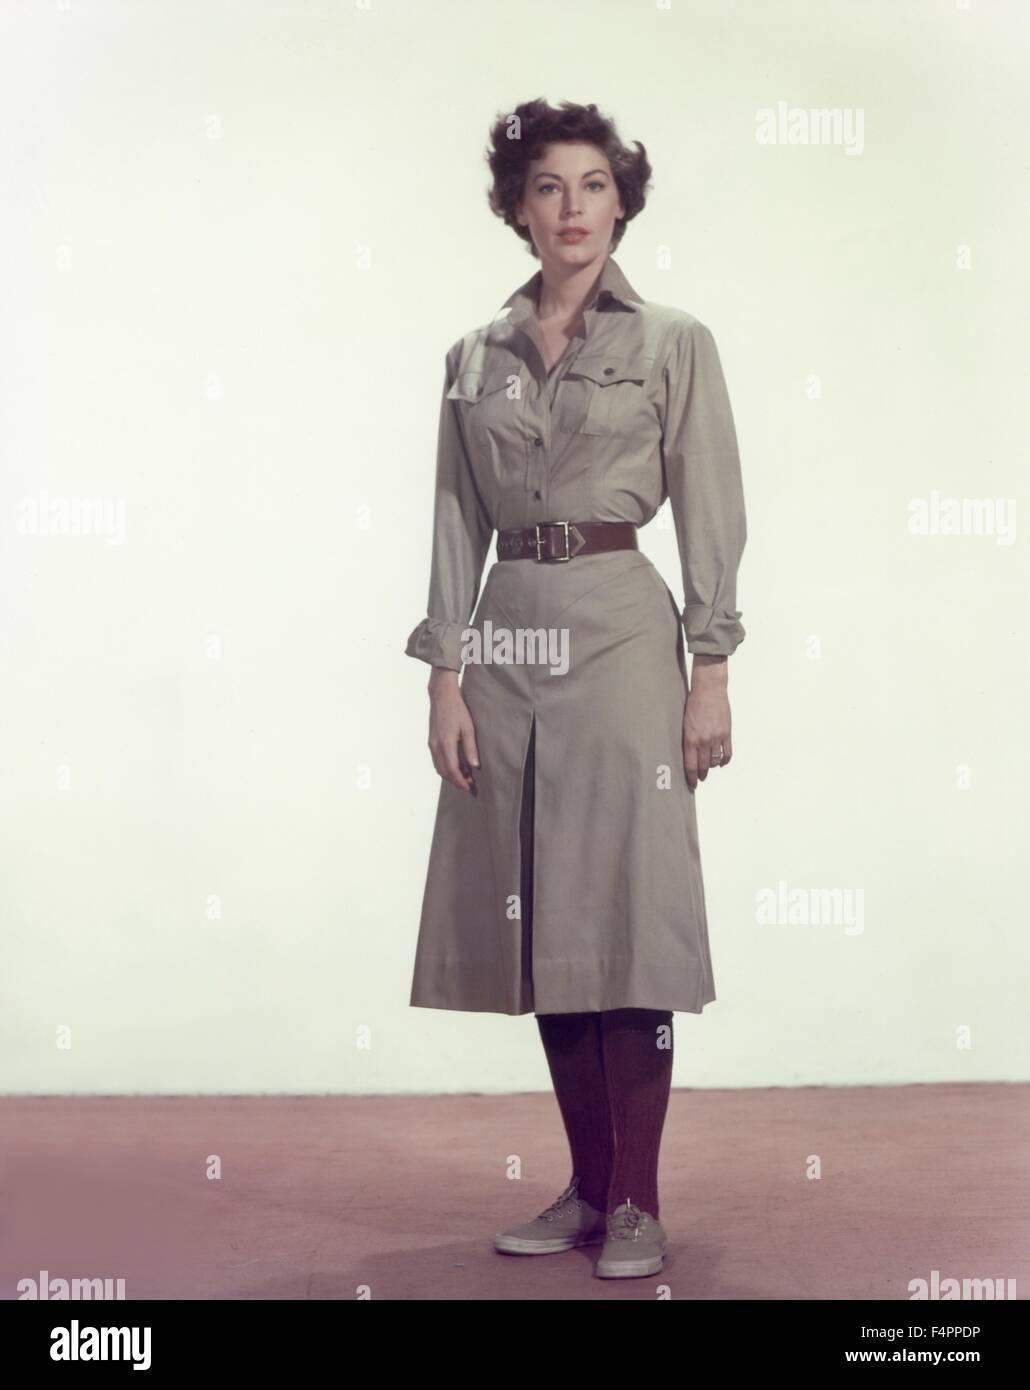 Ava Gardner / The Snows of Kilimanjaro / 1952 directed by Henry King [Twentieth Century Fox Film Corpo] - Stock Image